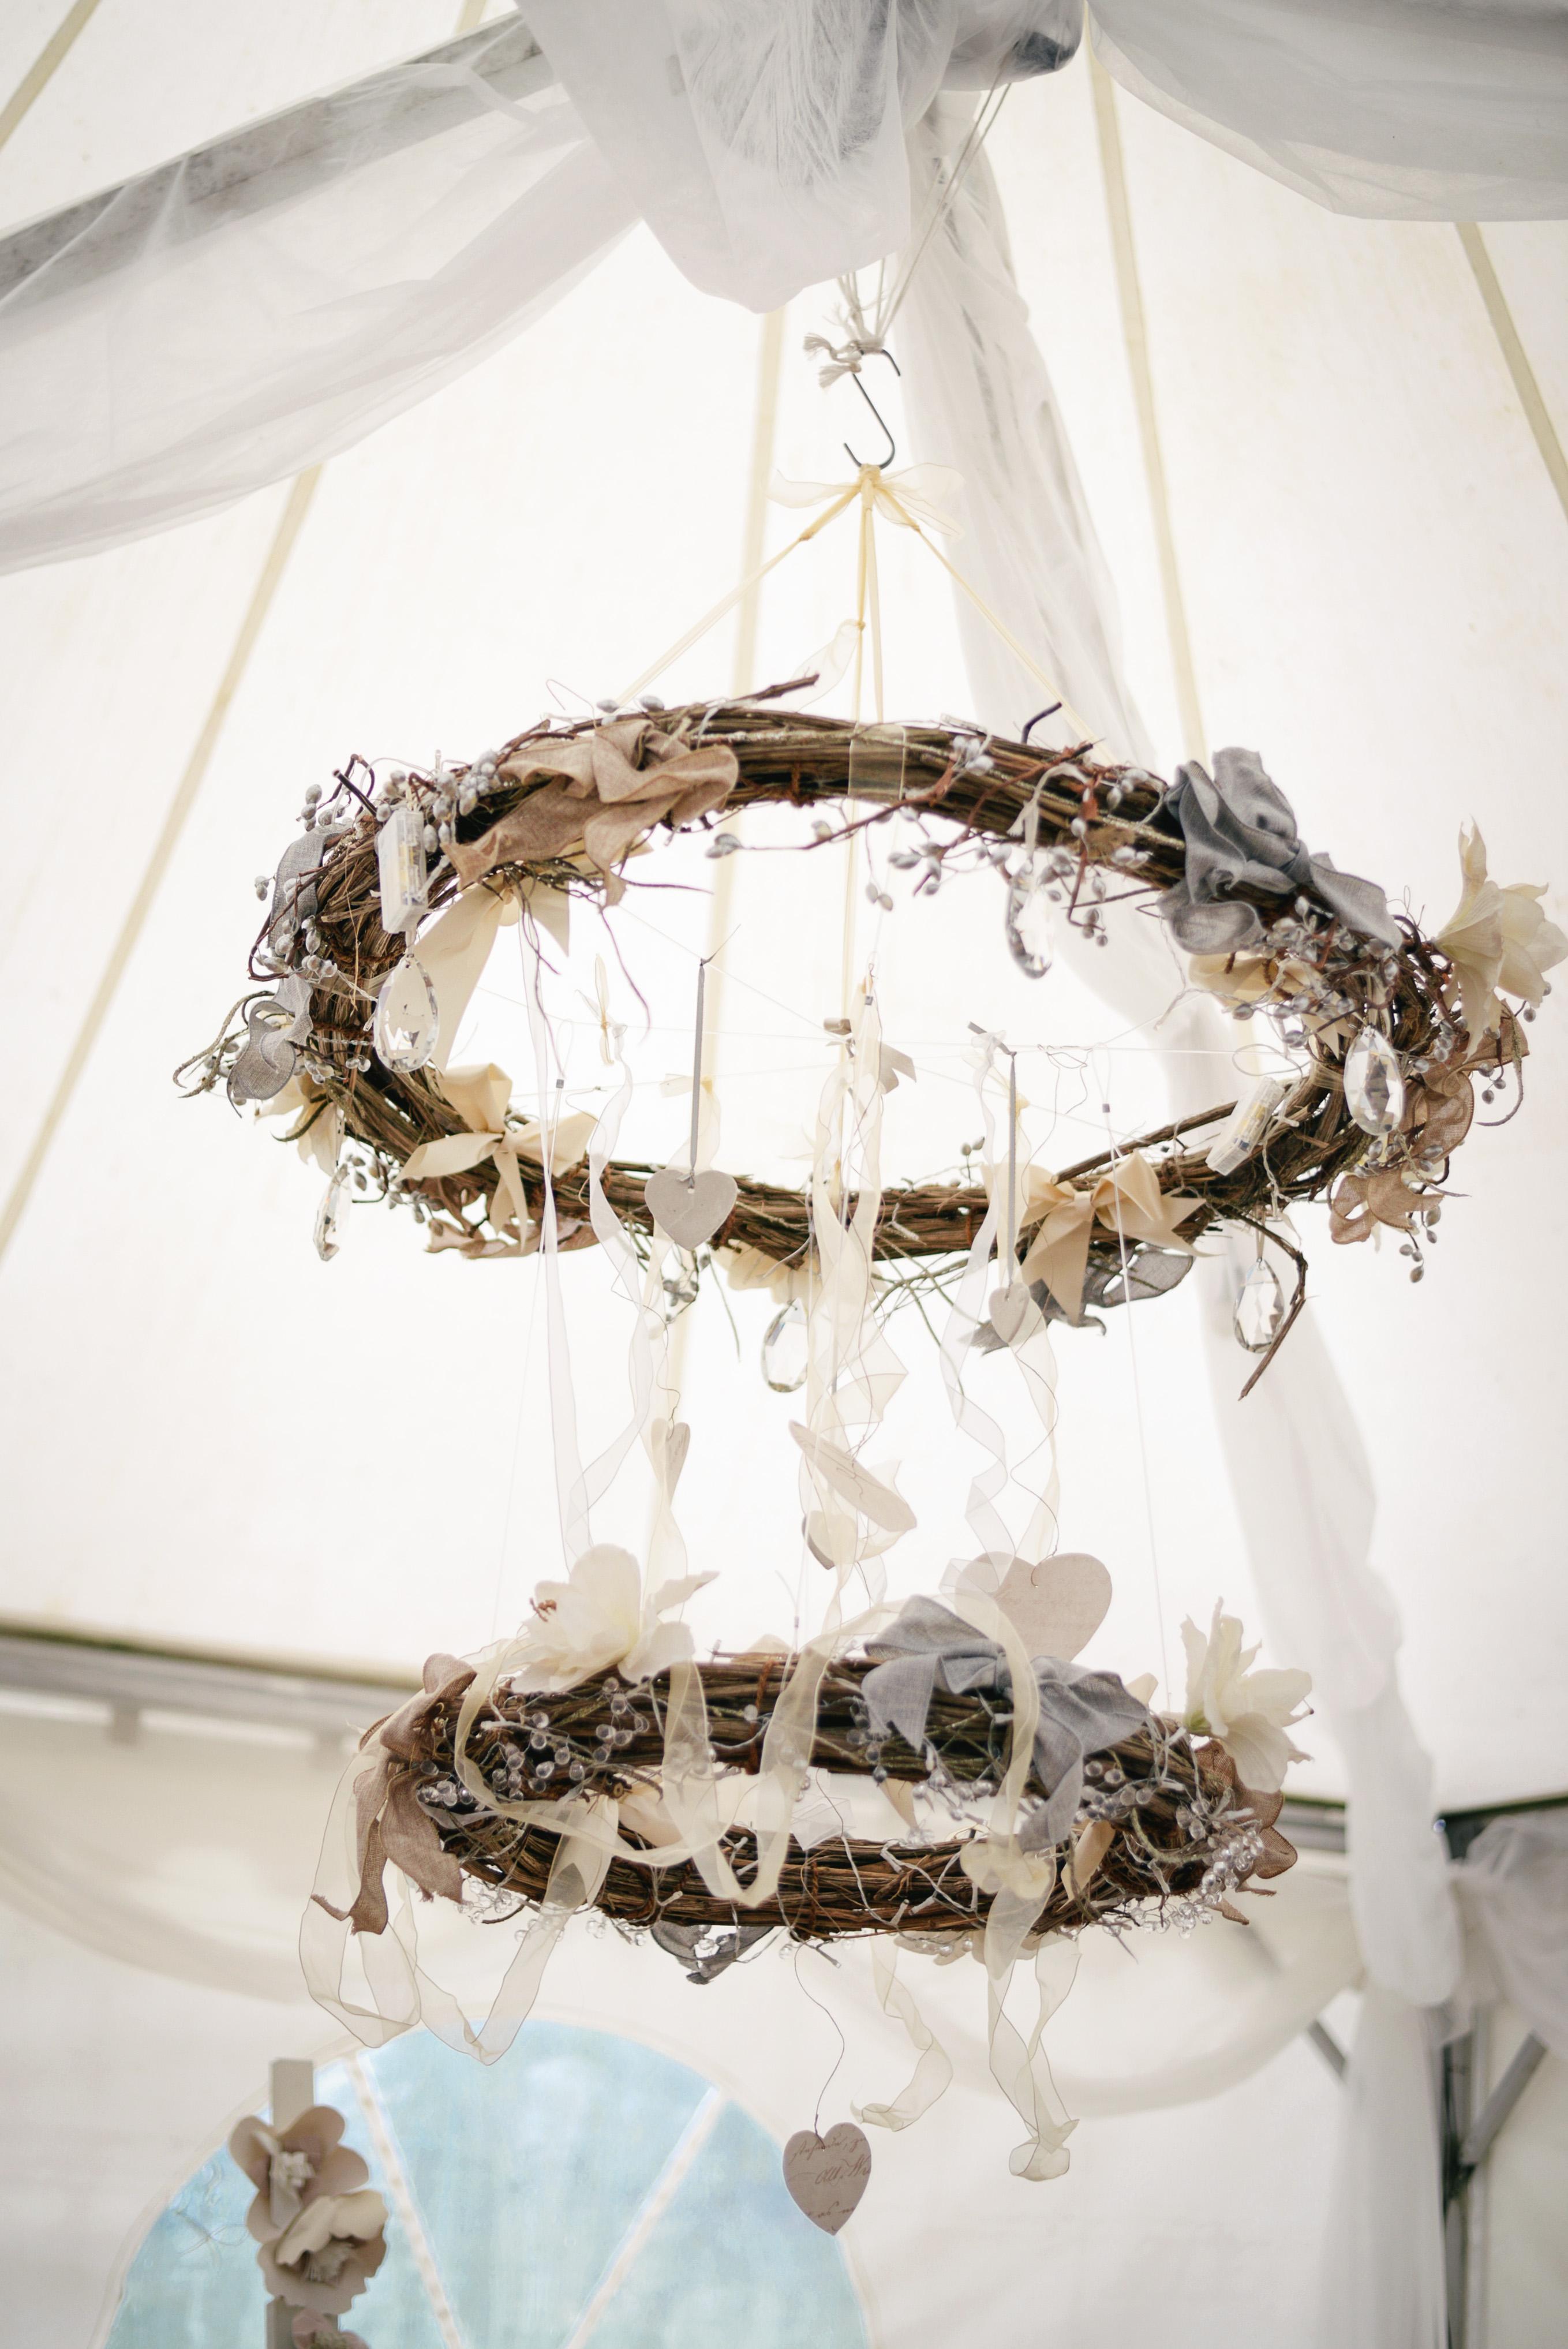 Ornate vintage chandaliers